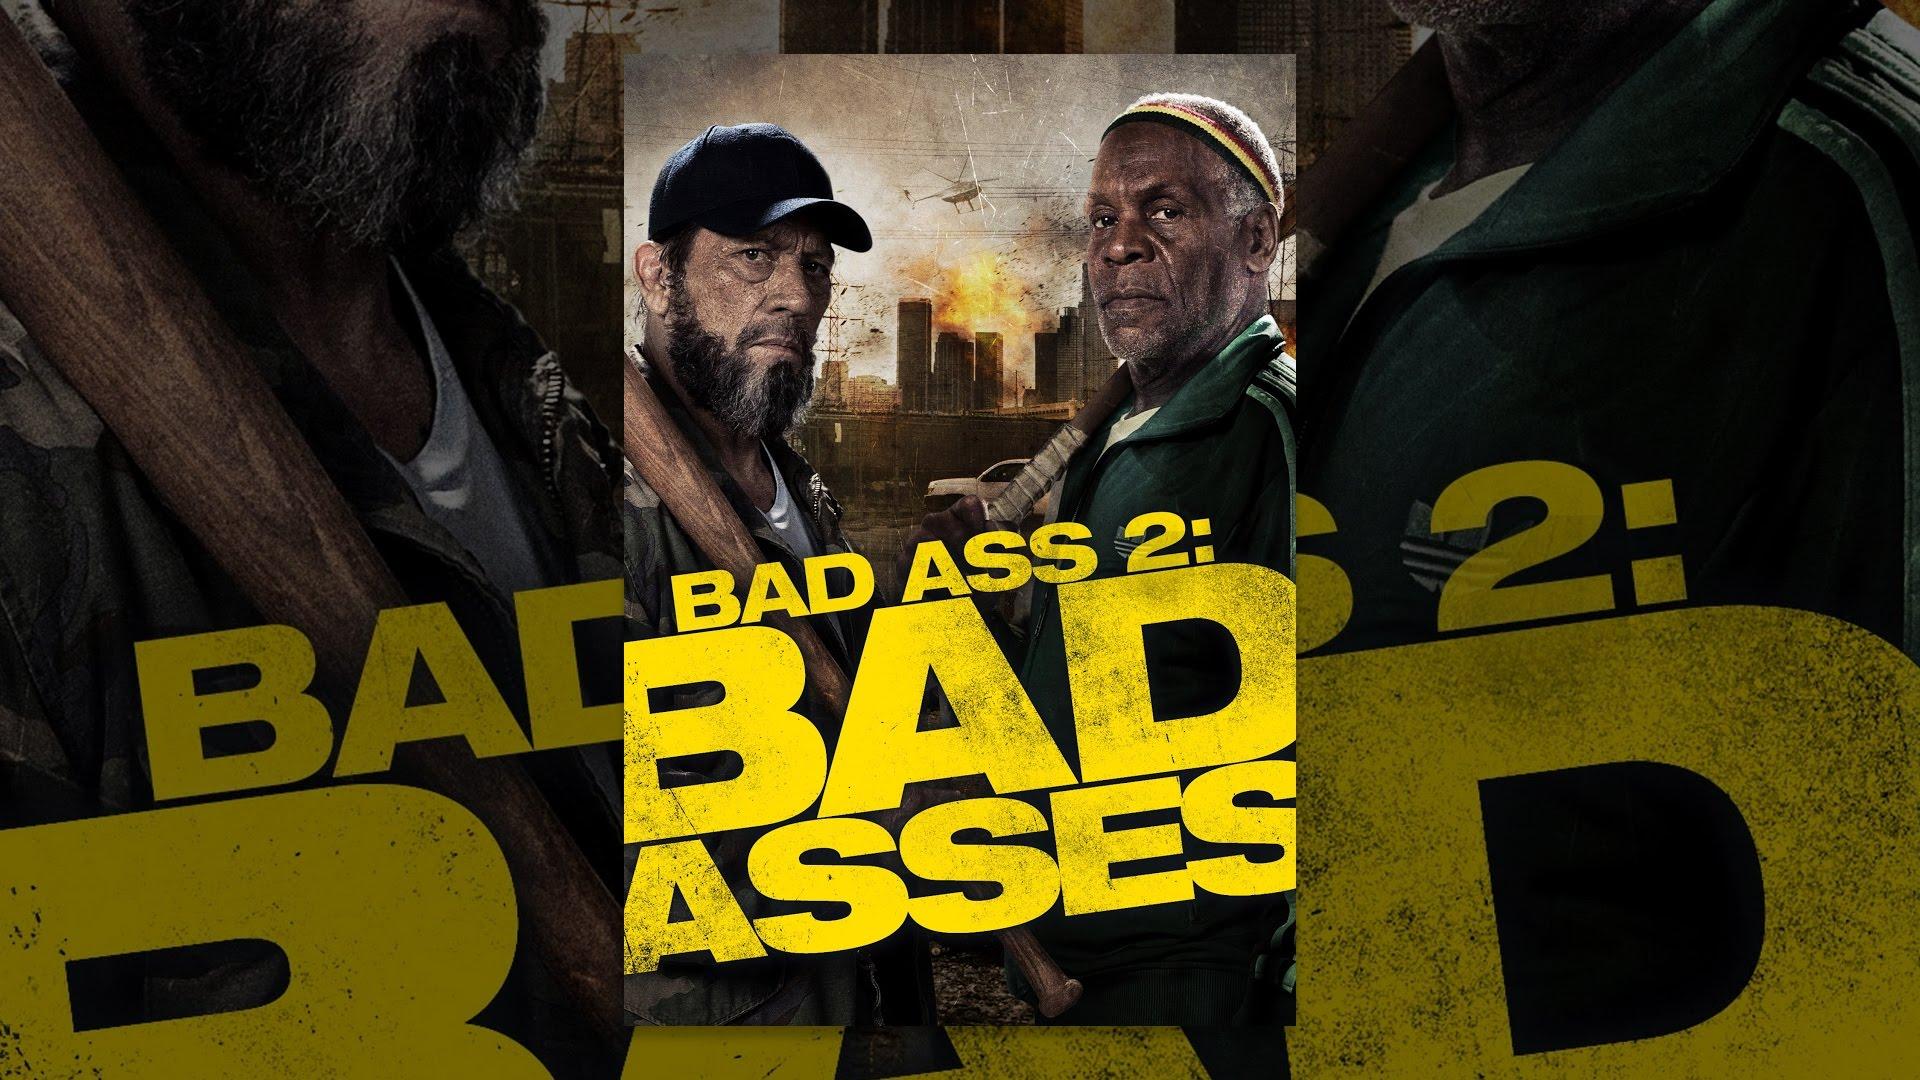 Bad Ass 2 Bad Asses